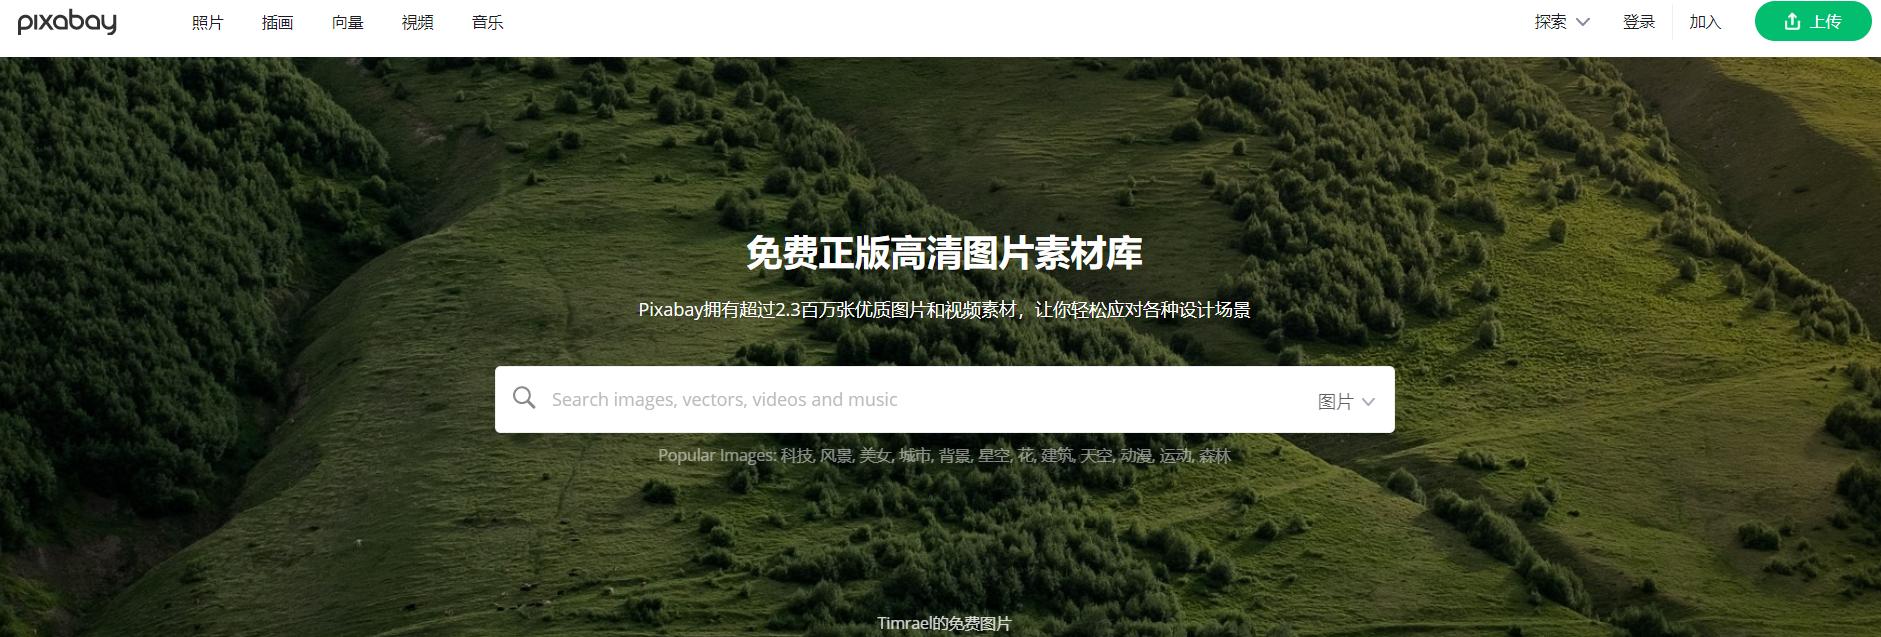 Pixabay可商用免费素材网